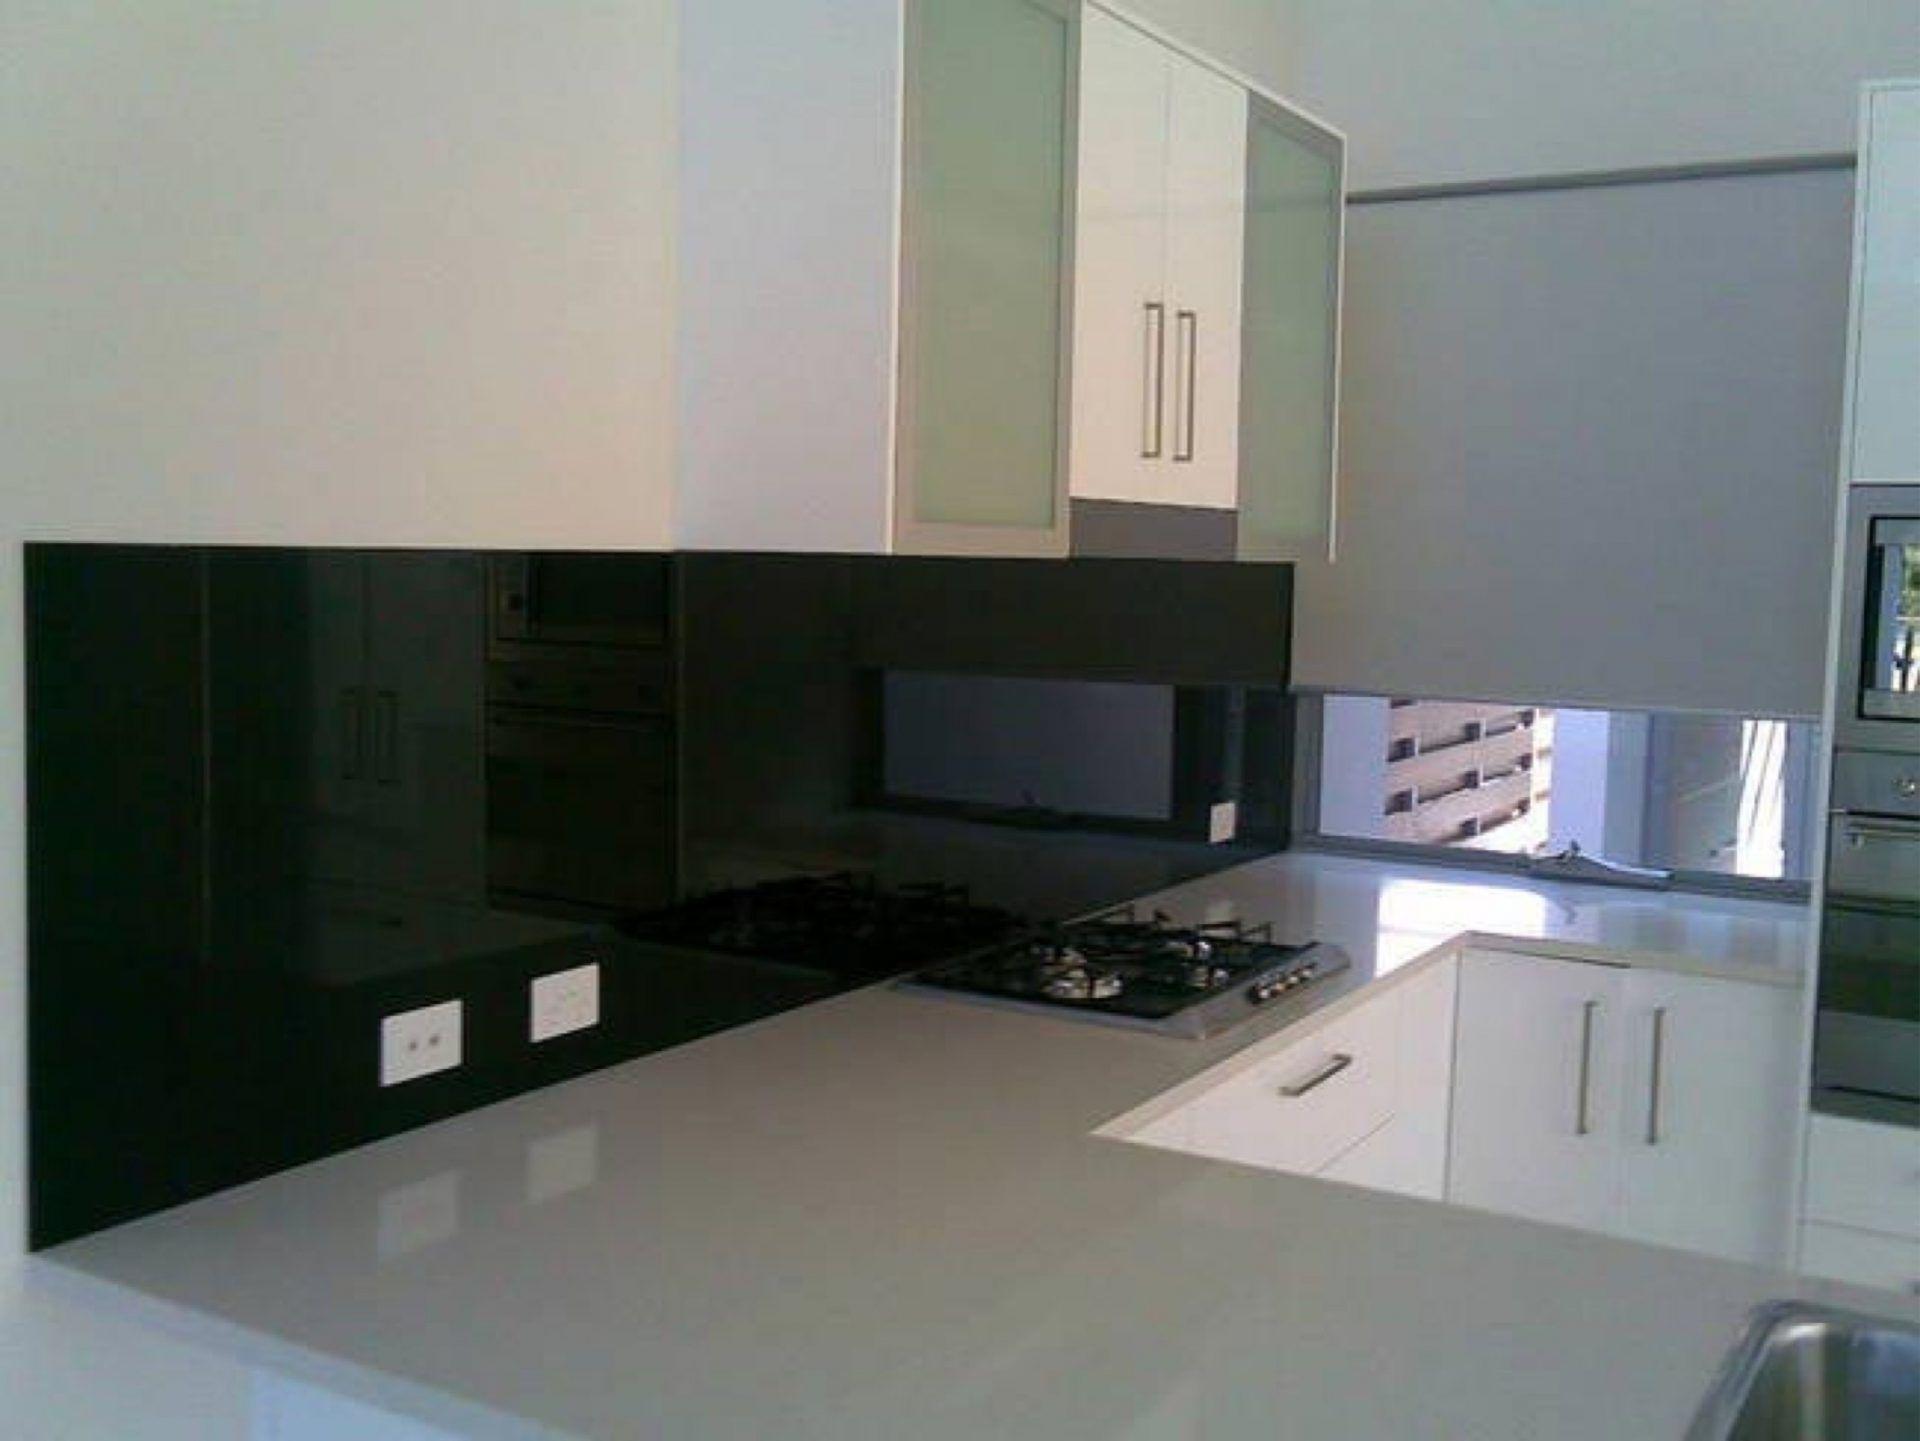 Keuken Glazen Achterwand : Keuken achterwand glasconcept